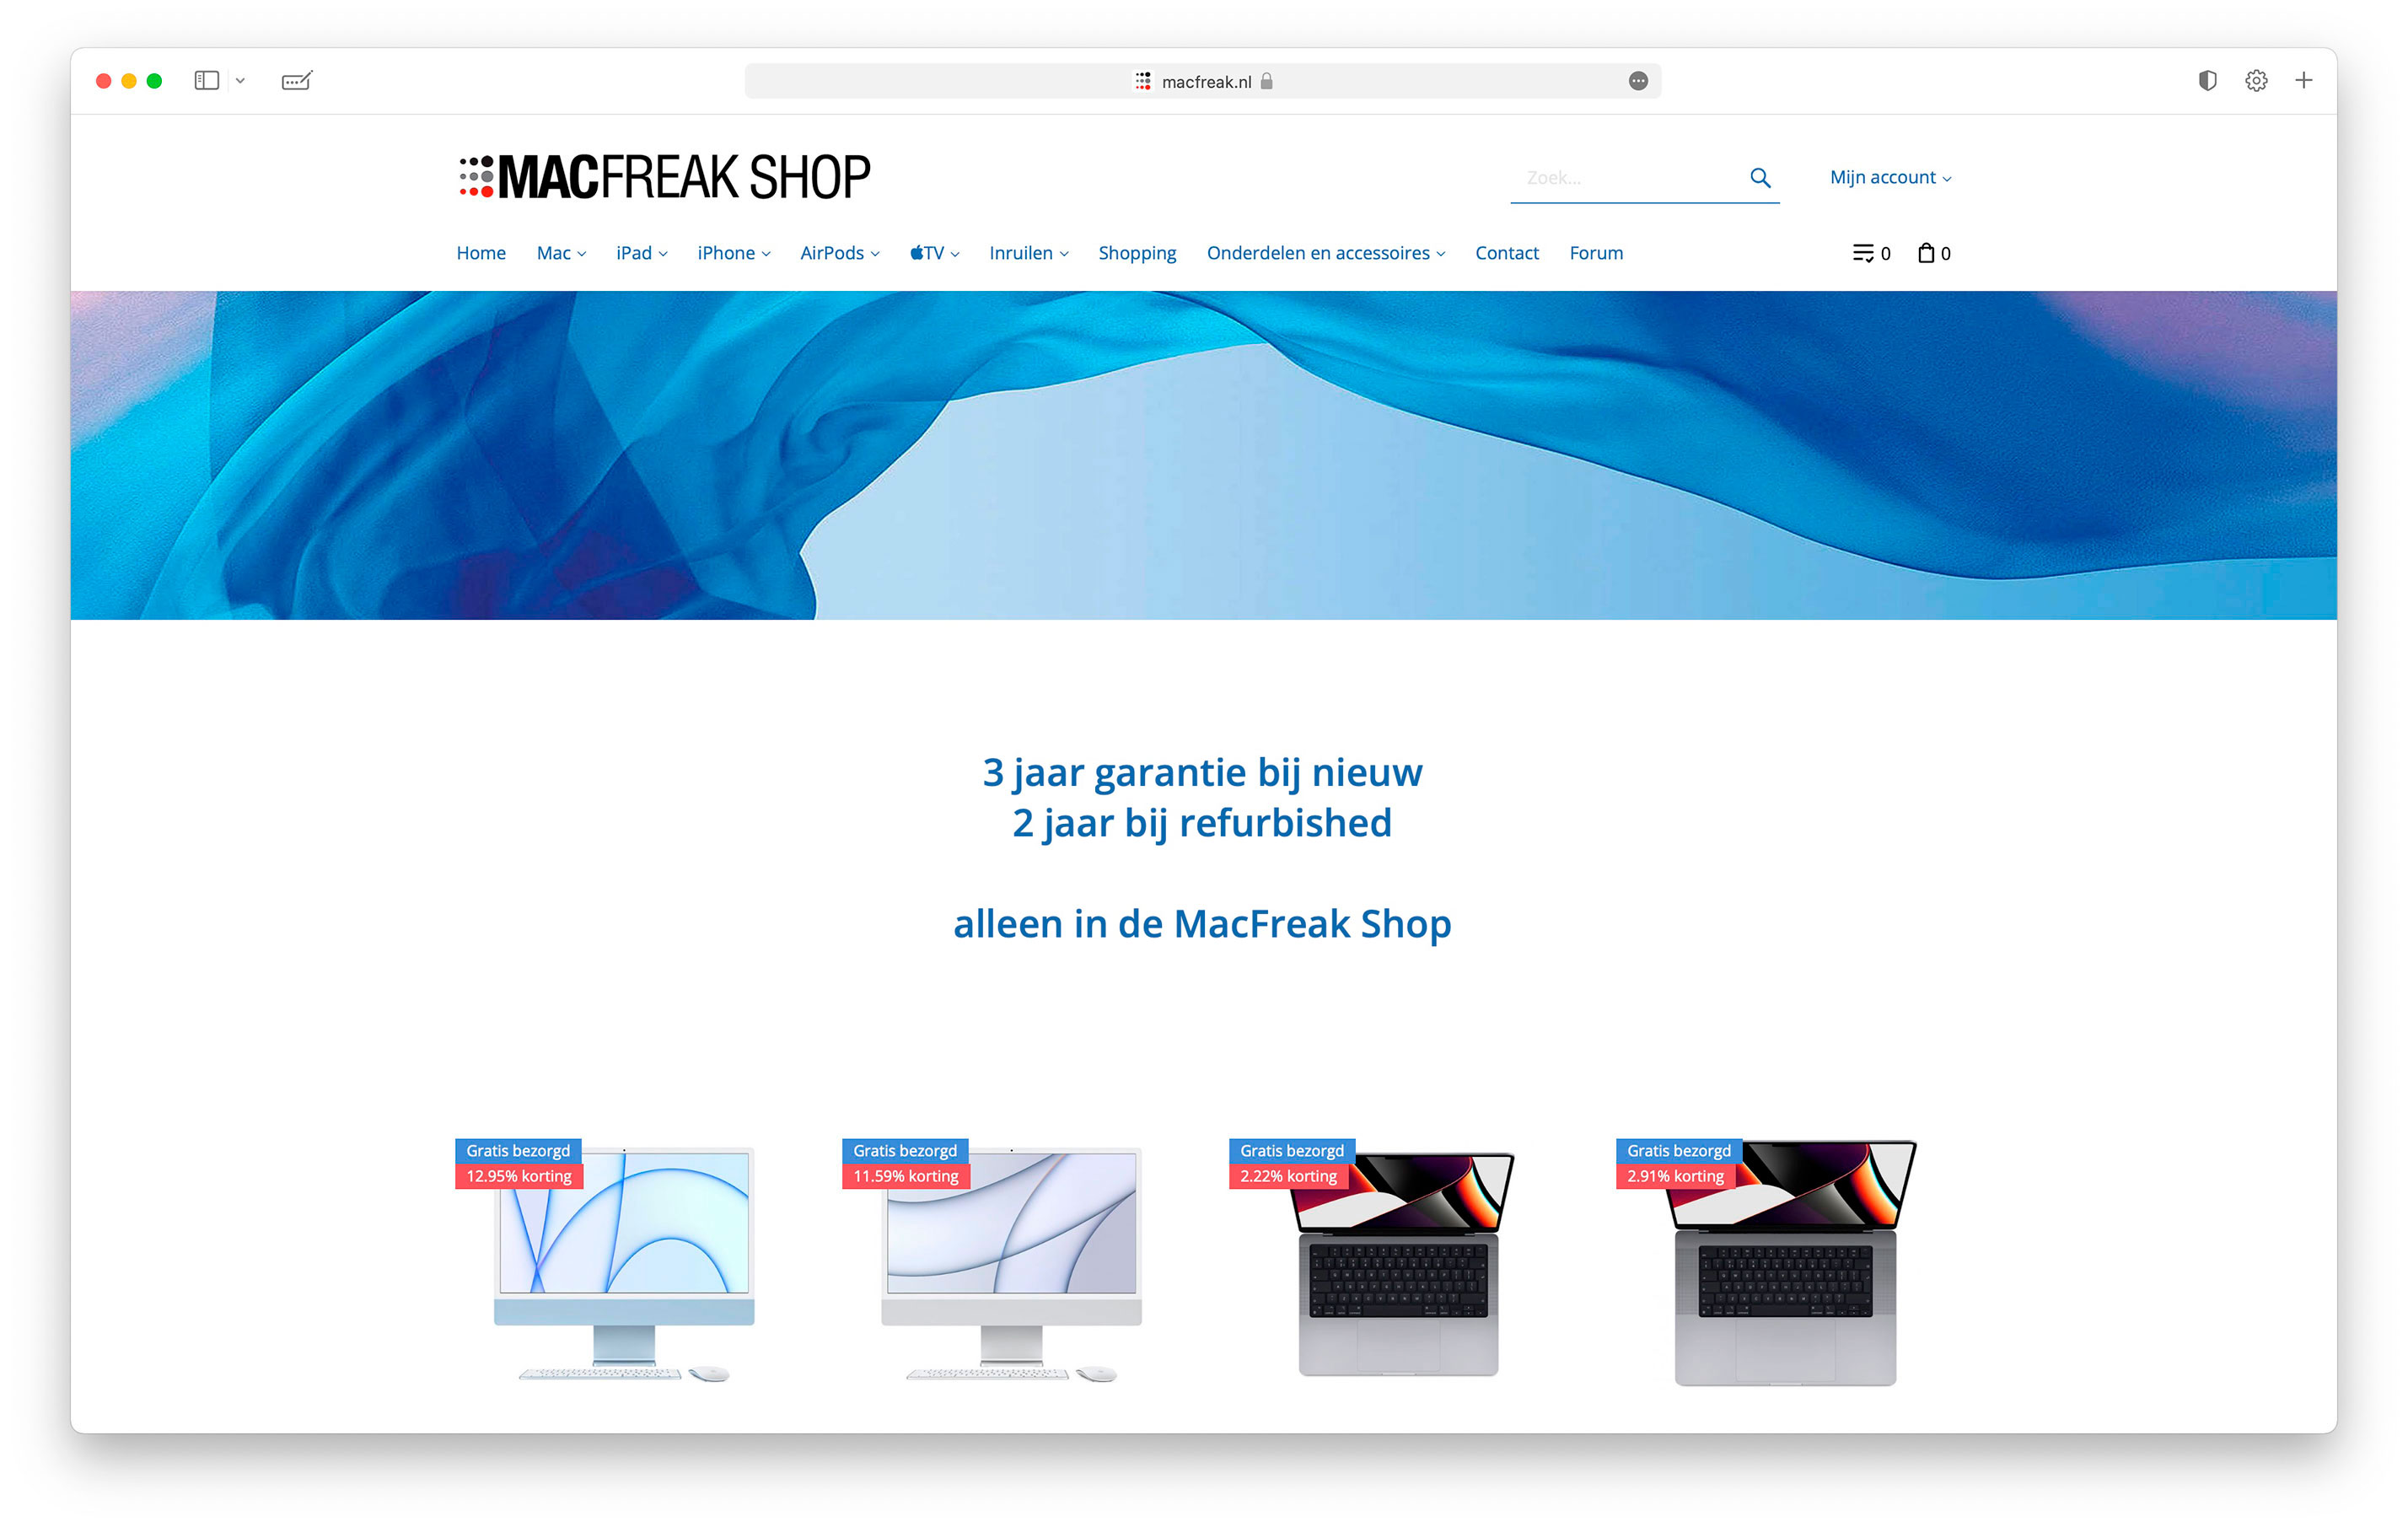 https://www.macfreak.nl/modules/news/images/zArt.MacFreakShopHomepage.jpg